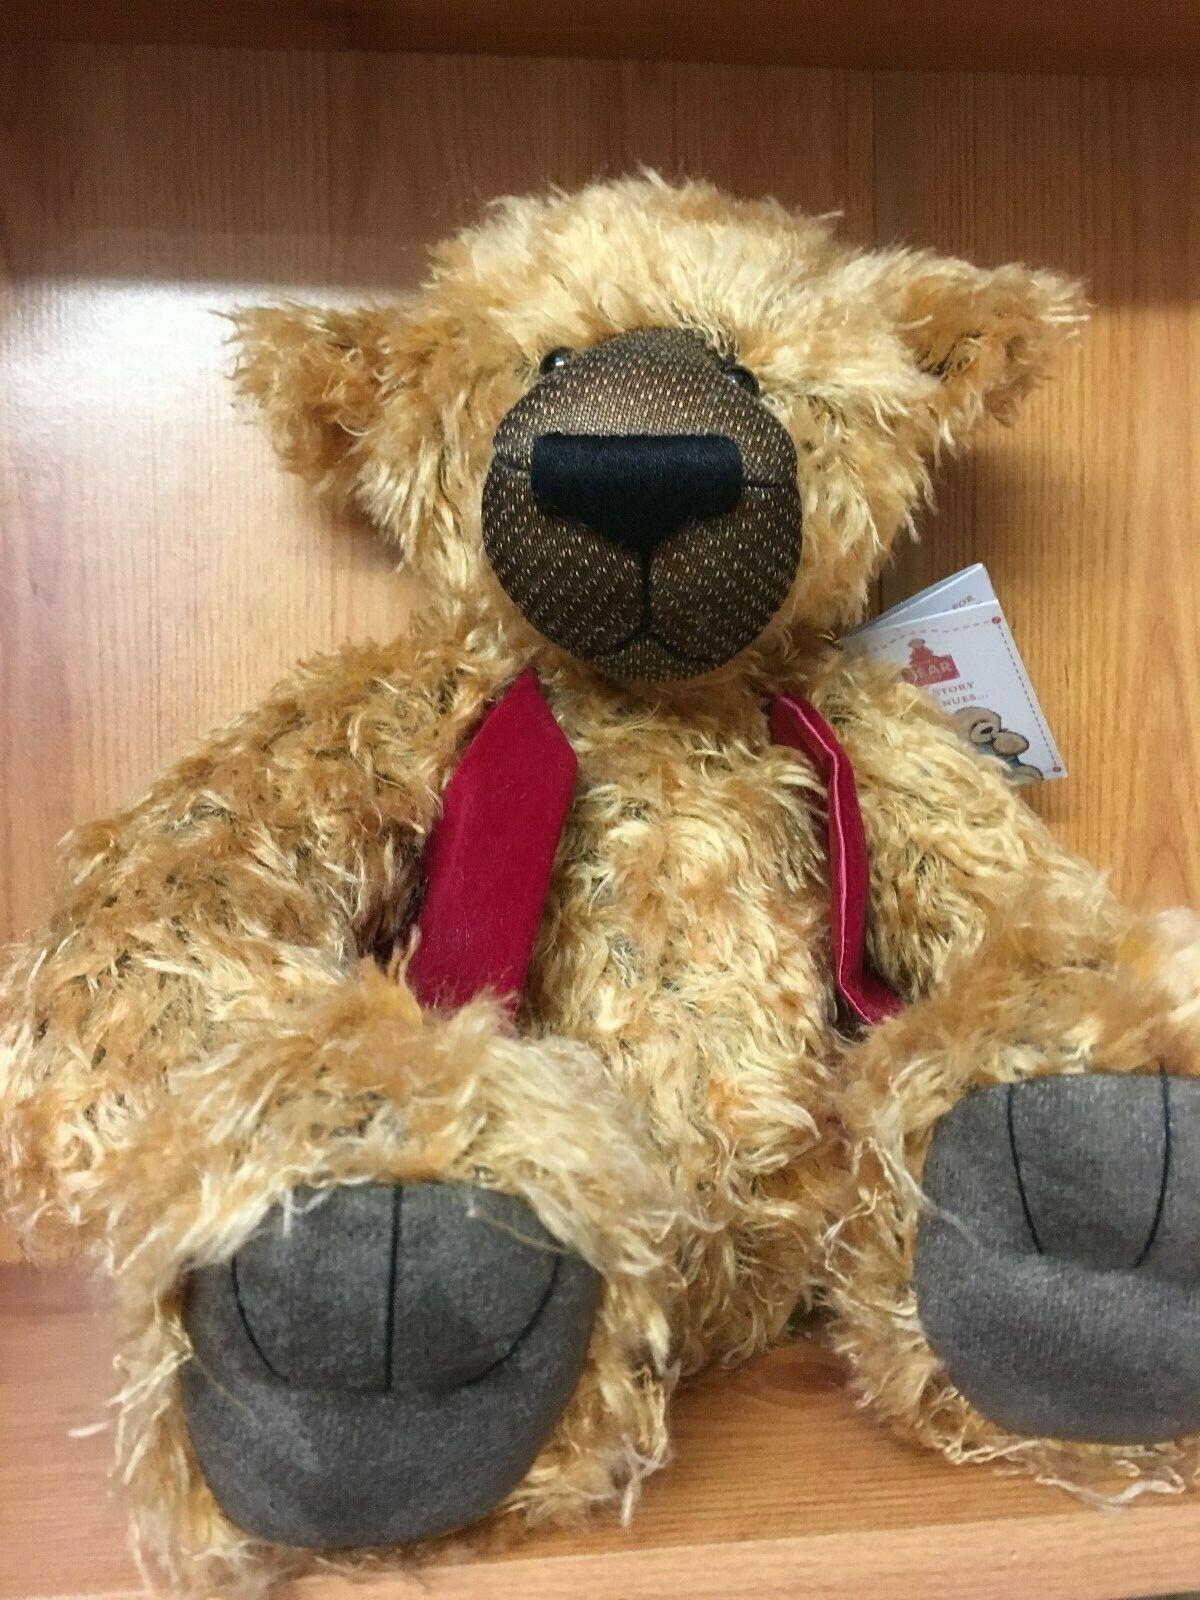 CHARLIE BEARS ALICES BEAR SHOP BEARS WOODROFFE + FREE BOOK